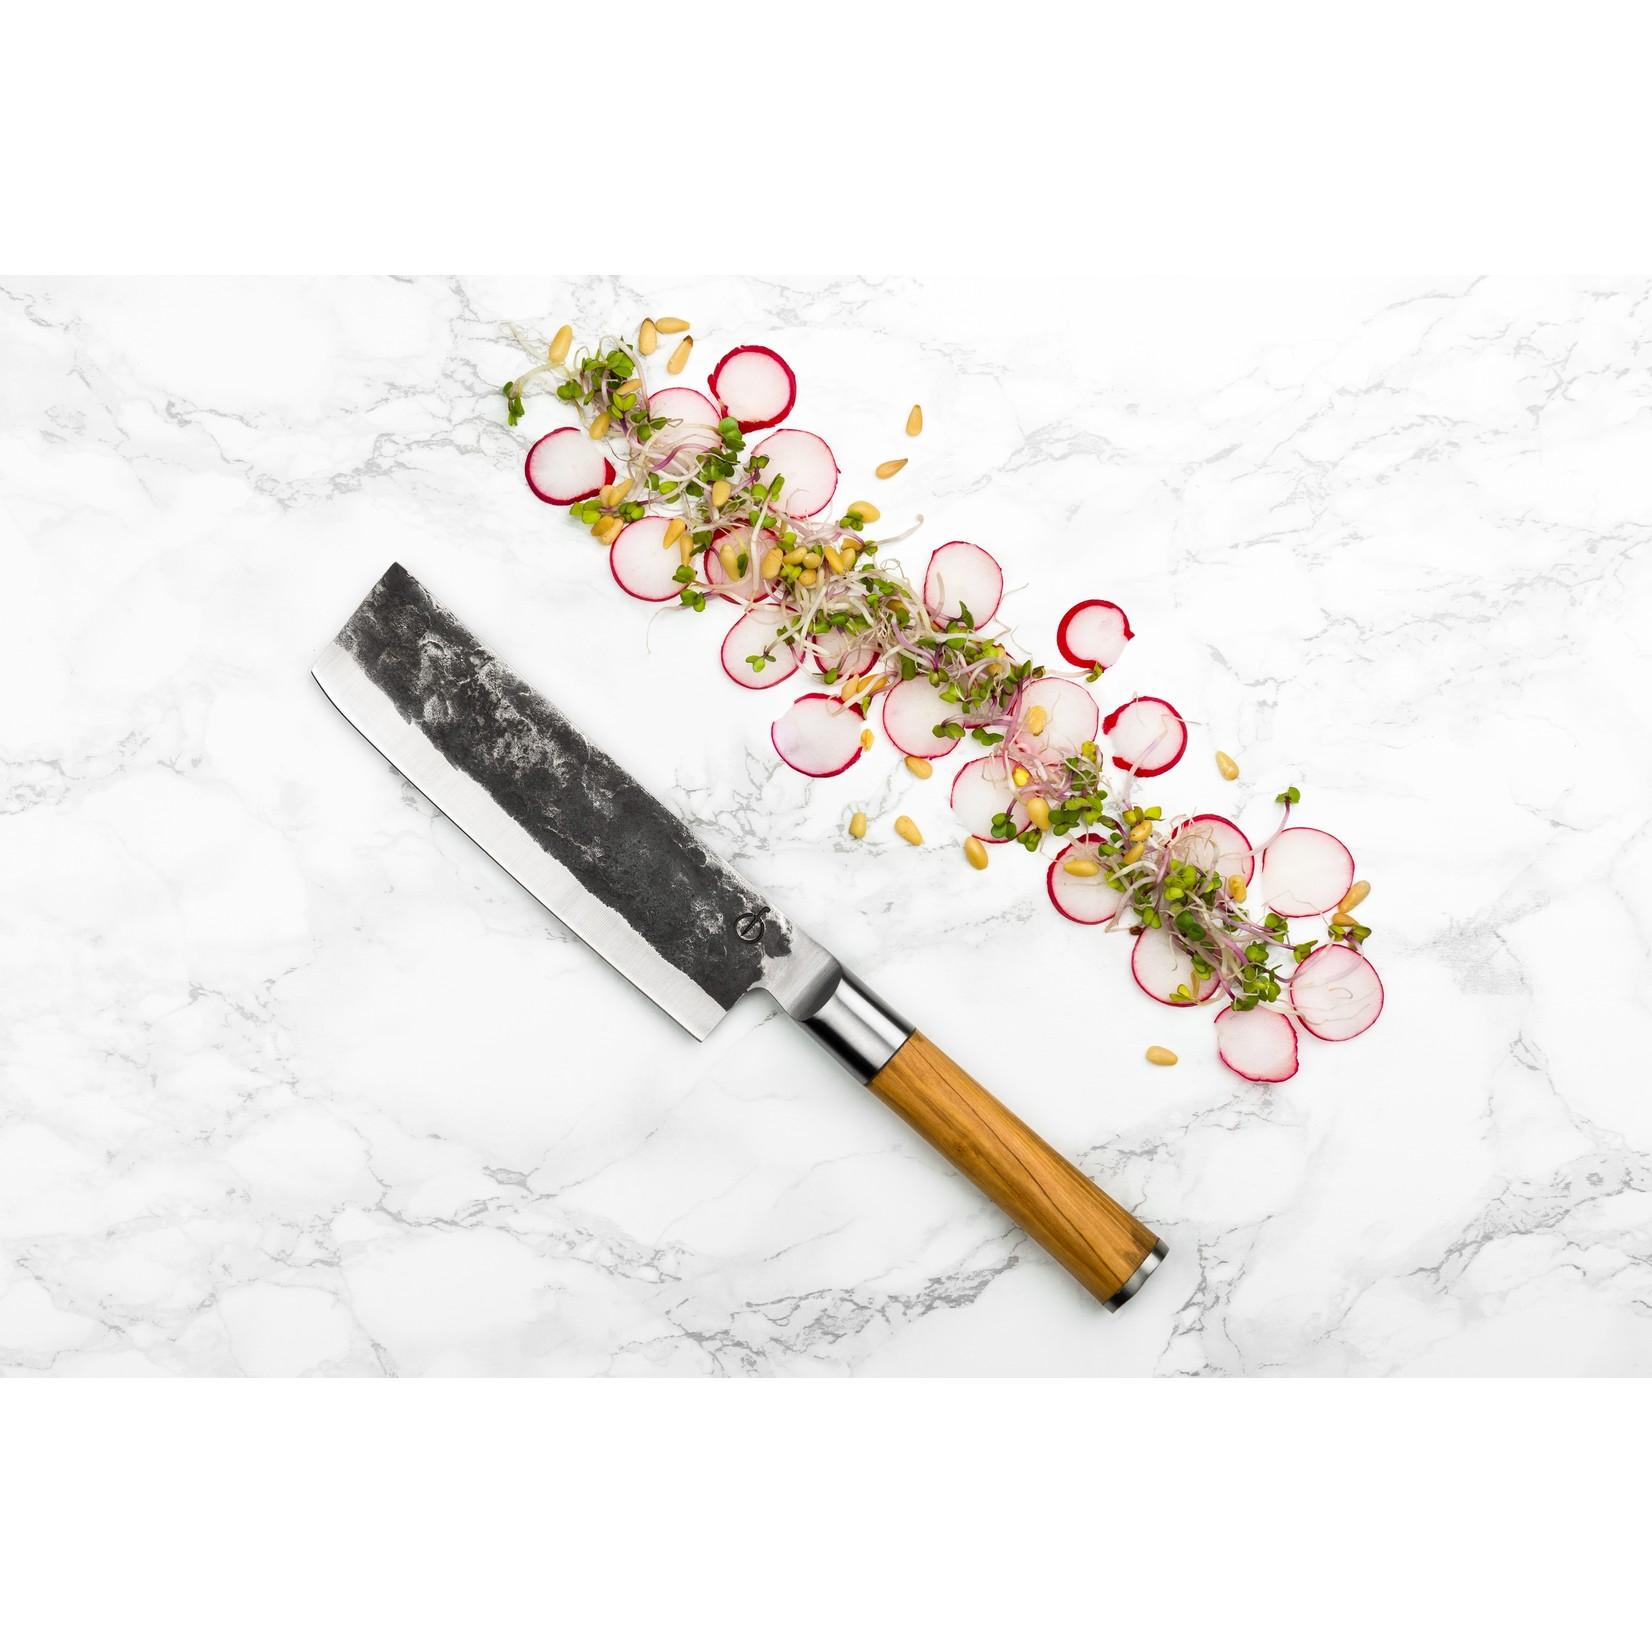 Forged Forged Olive  hakbijl 17cm